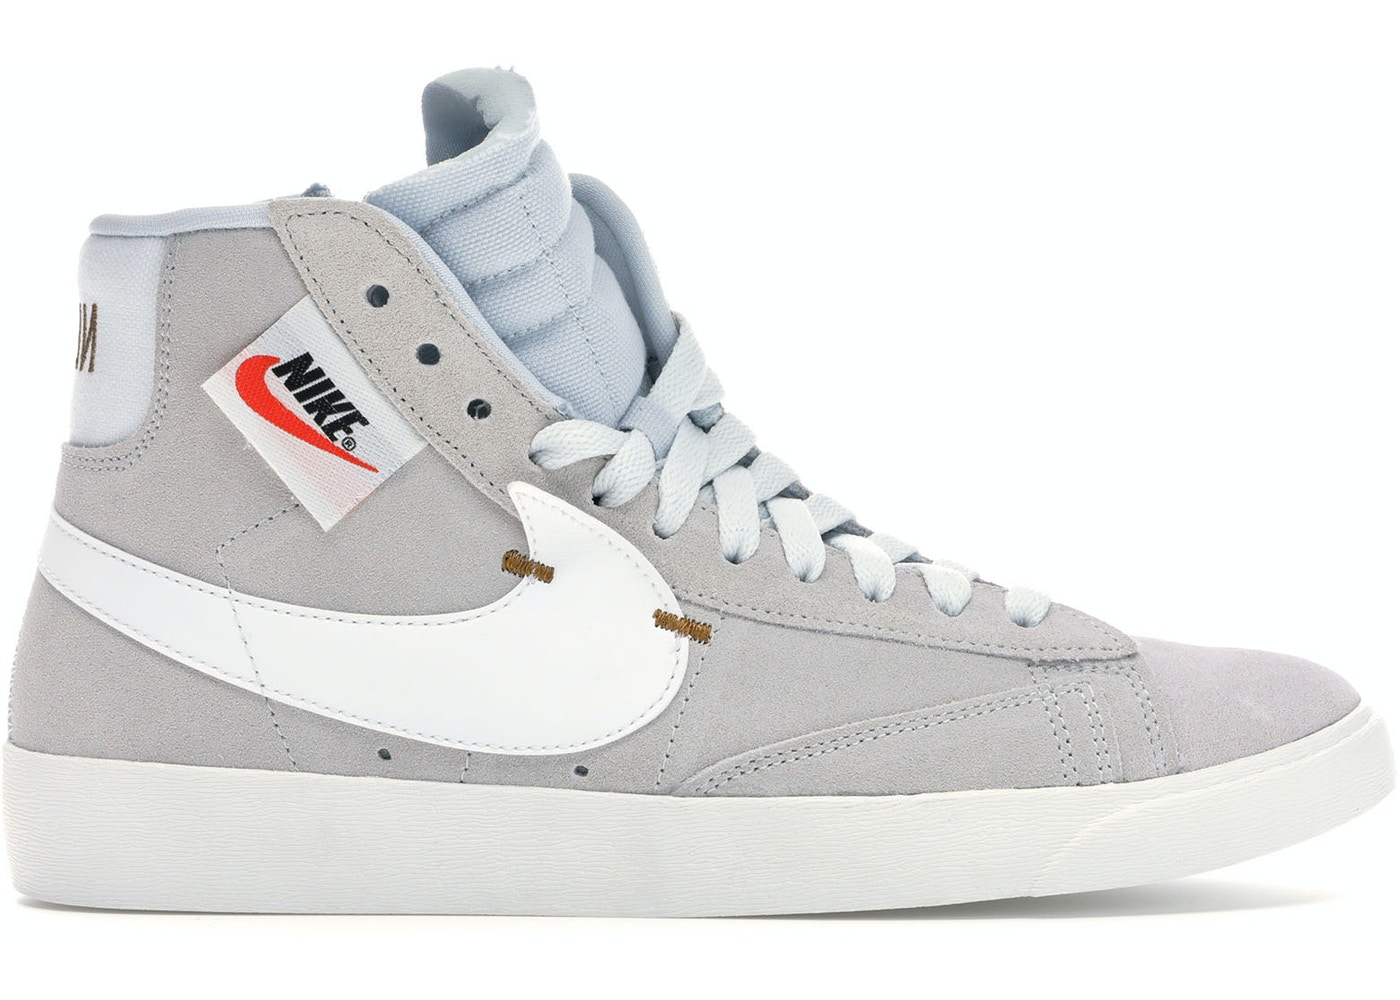 Arqueológico Elaborar El respeto  Nike Blazer Mid Rebel Off White (W) - BQ4022-101